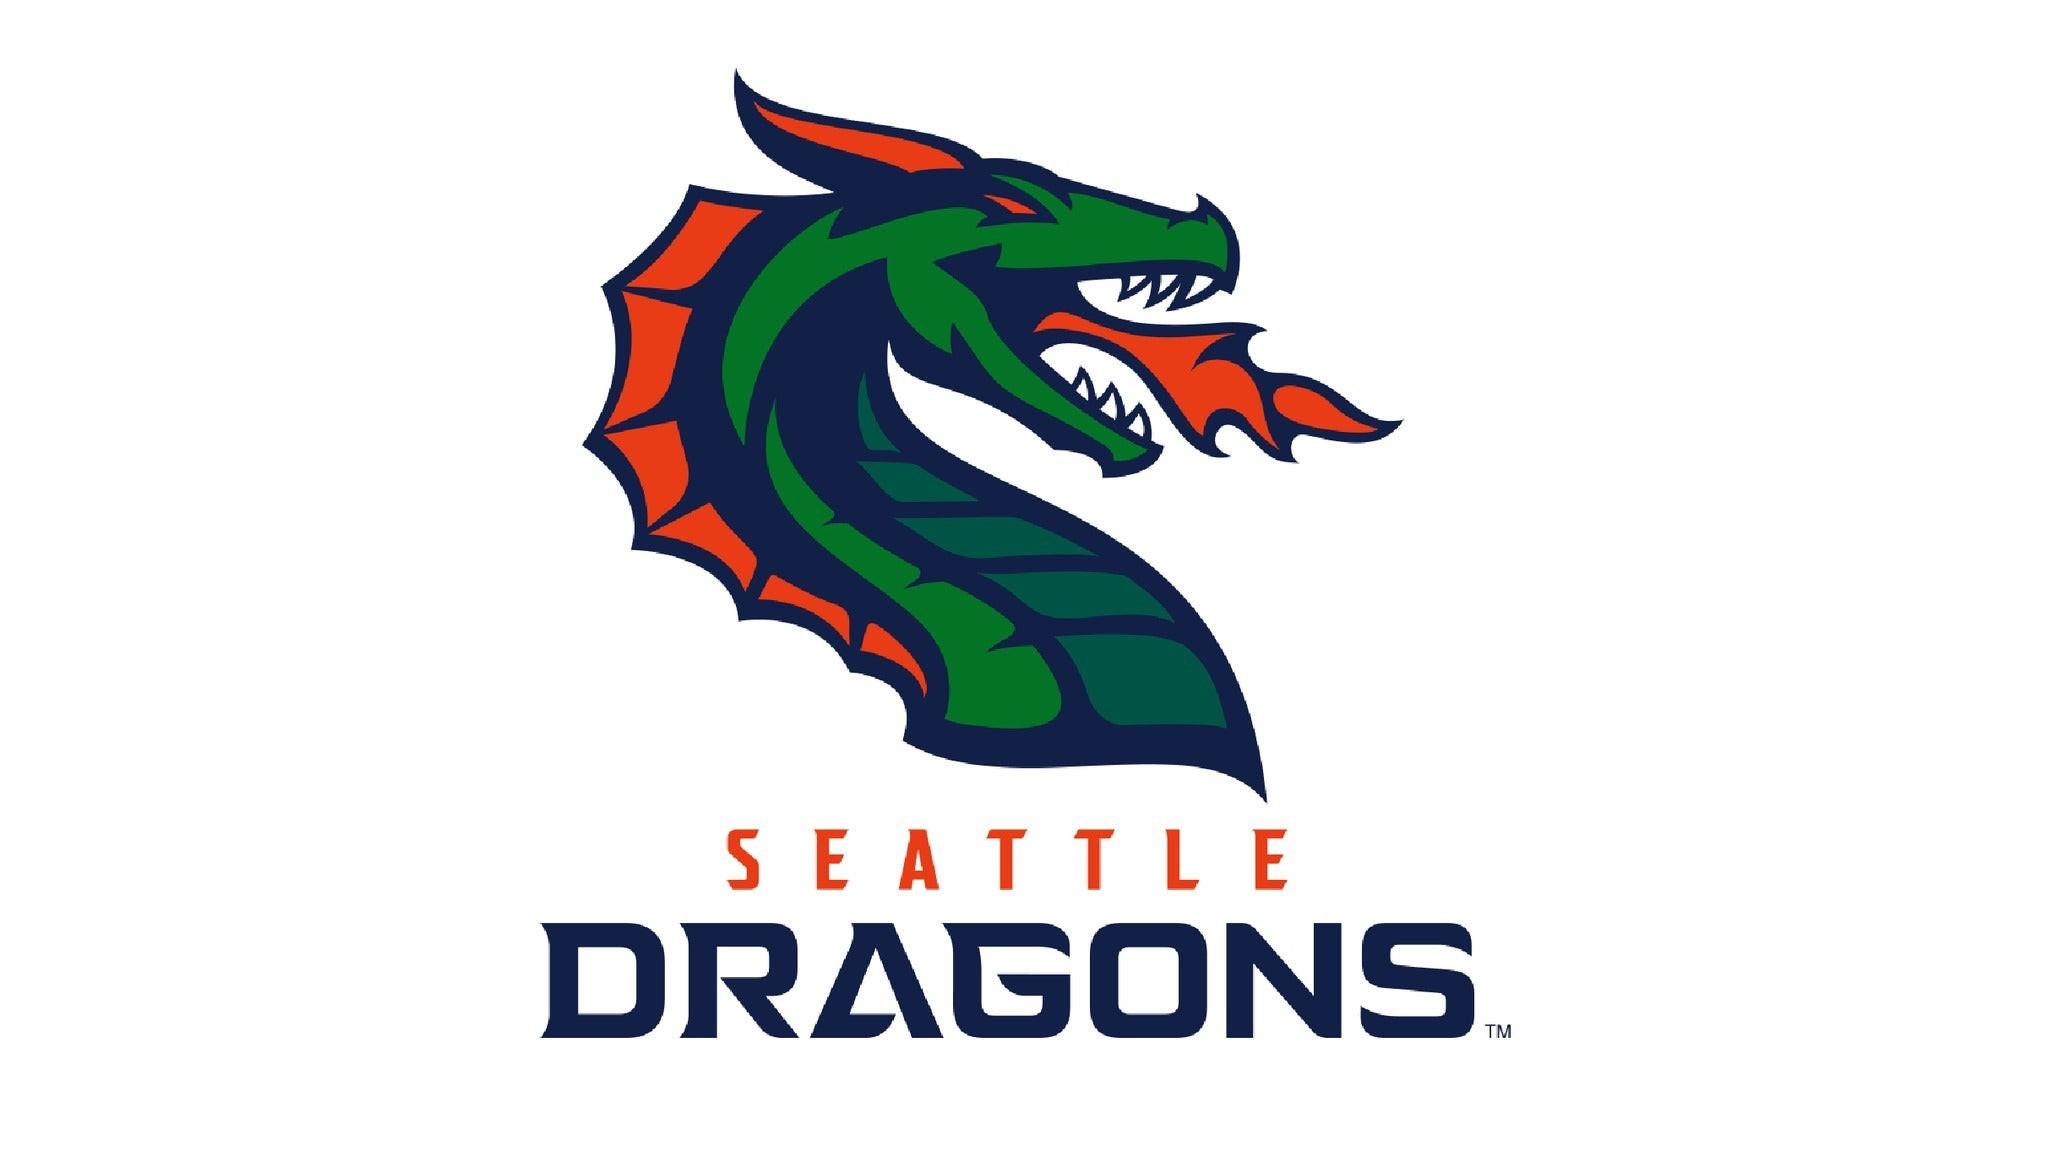 Seattle Dragons XFL 2020 Season at CenturyLink Field in.